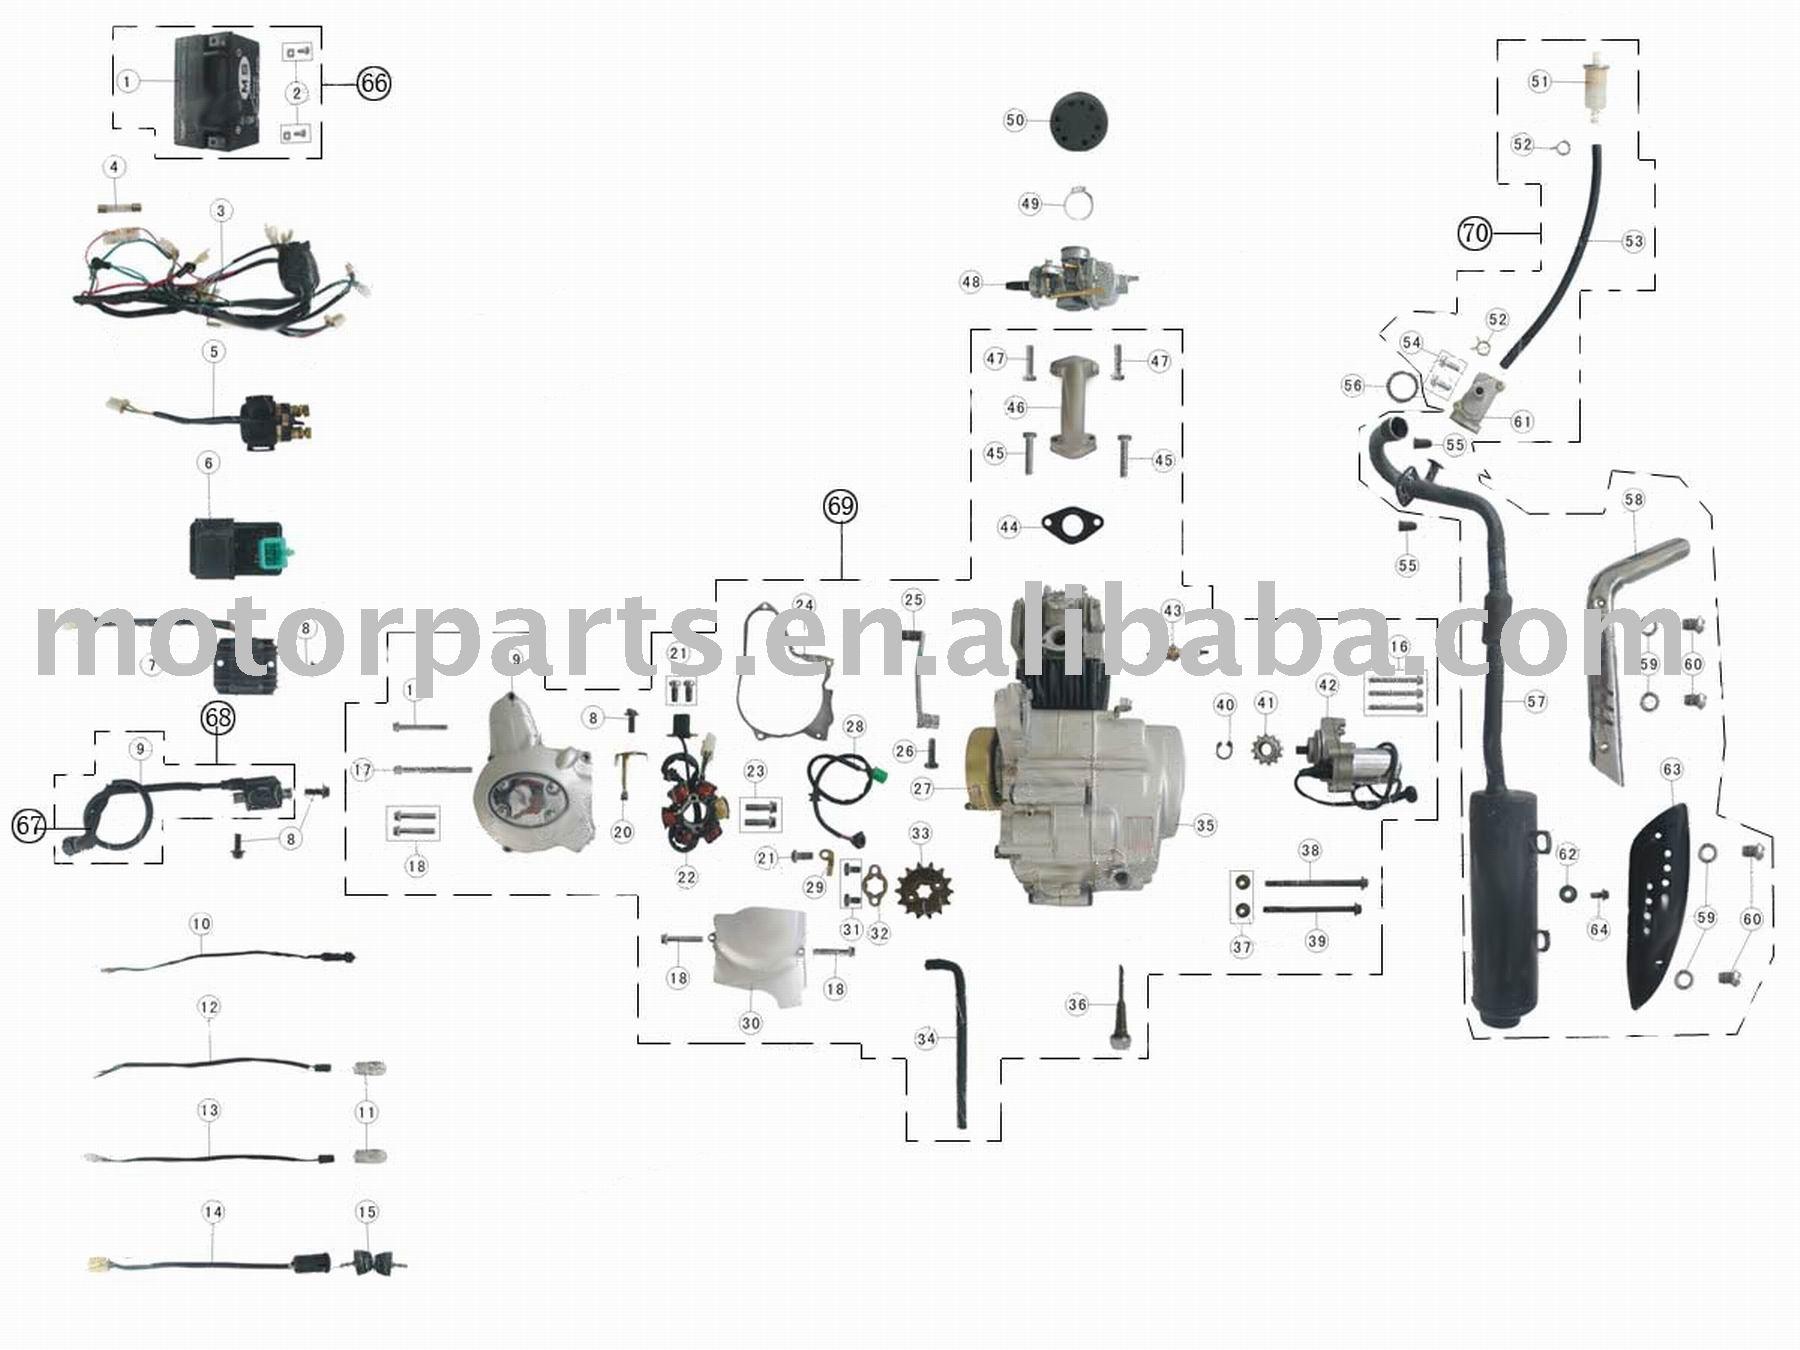 Pit Bike  26 Honda 50 2F70 Engine size besides 110 Quad Wiring Diagram additionally Ssr Dirt Bike Engine Diagram moreover Ssr 90 Wiring Diagram besides Dirt Bike Wire Diagram. on for ssr 110 atv wiring diagram